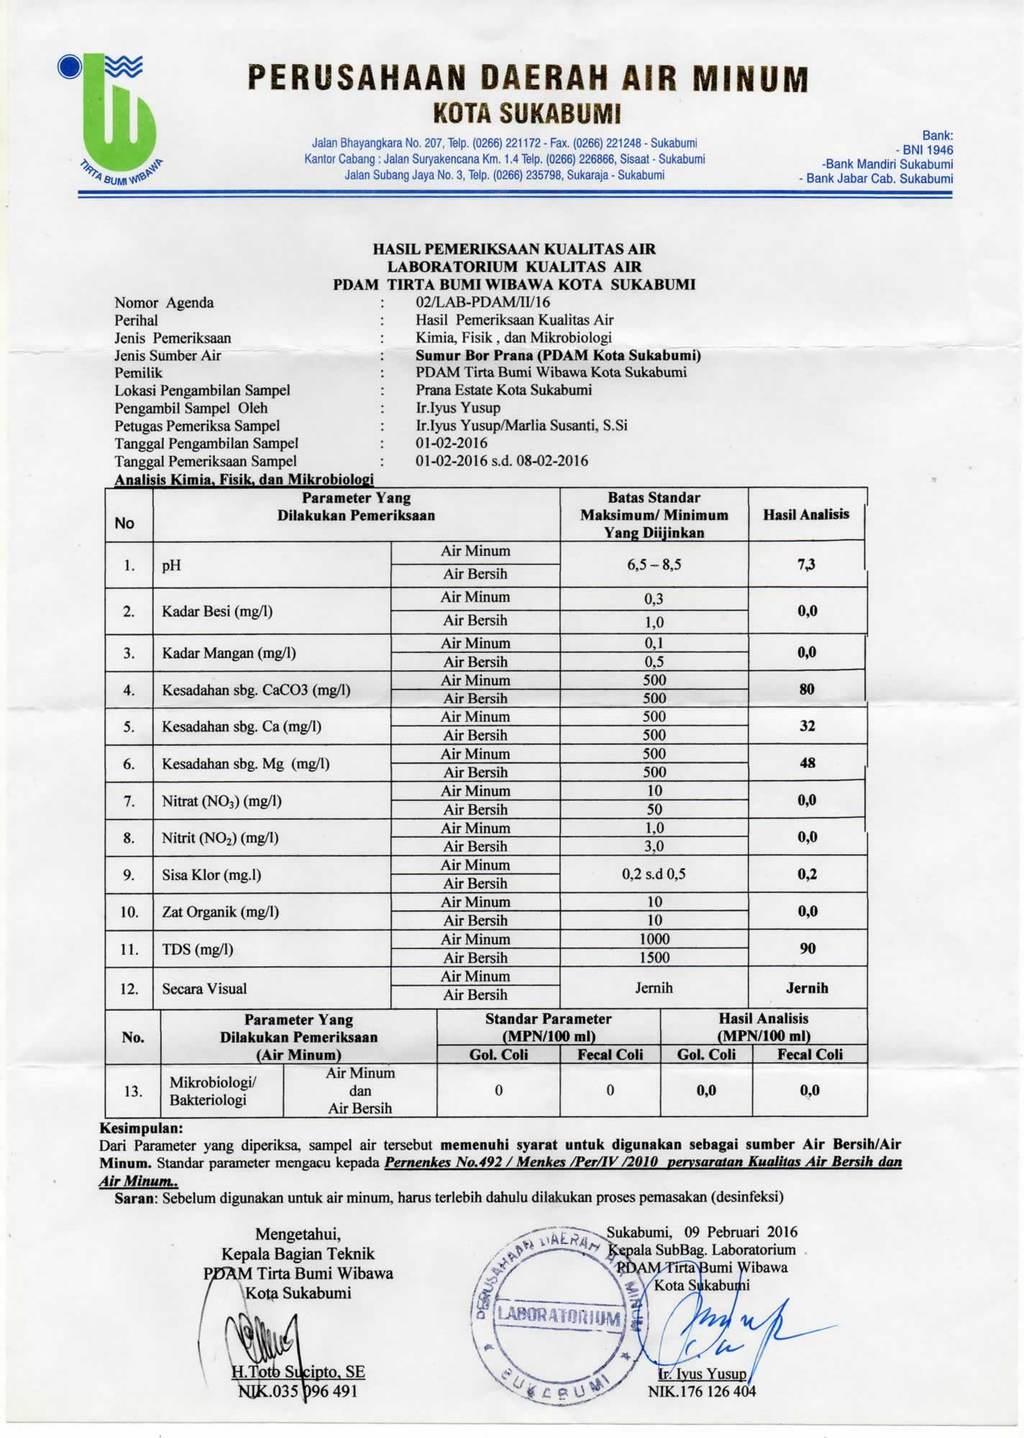 PDAM kota sukabumi tersedia di Prana Estate Sukabumi